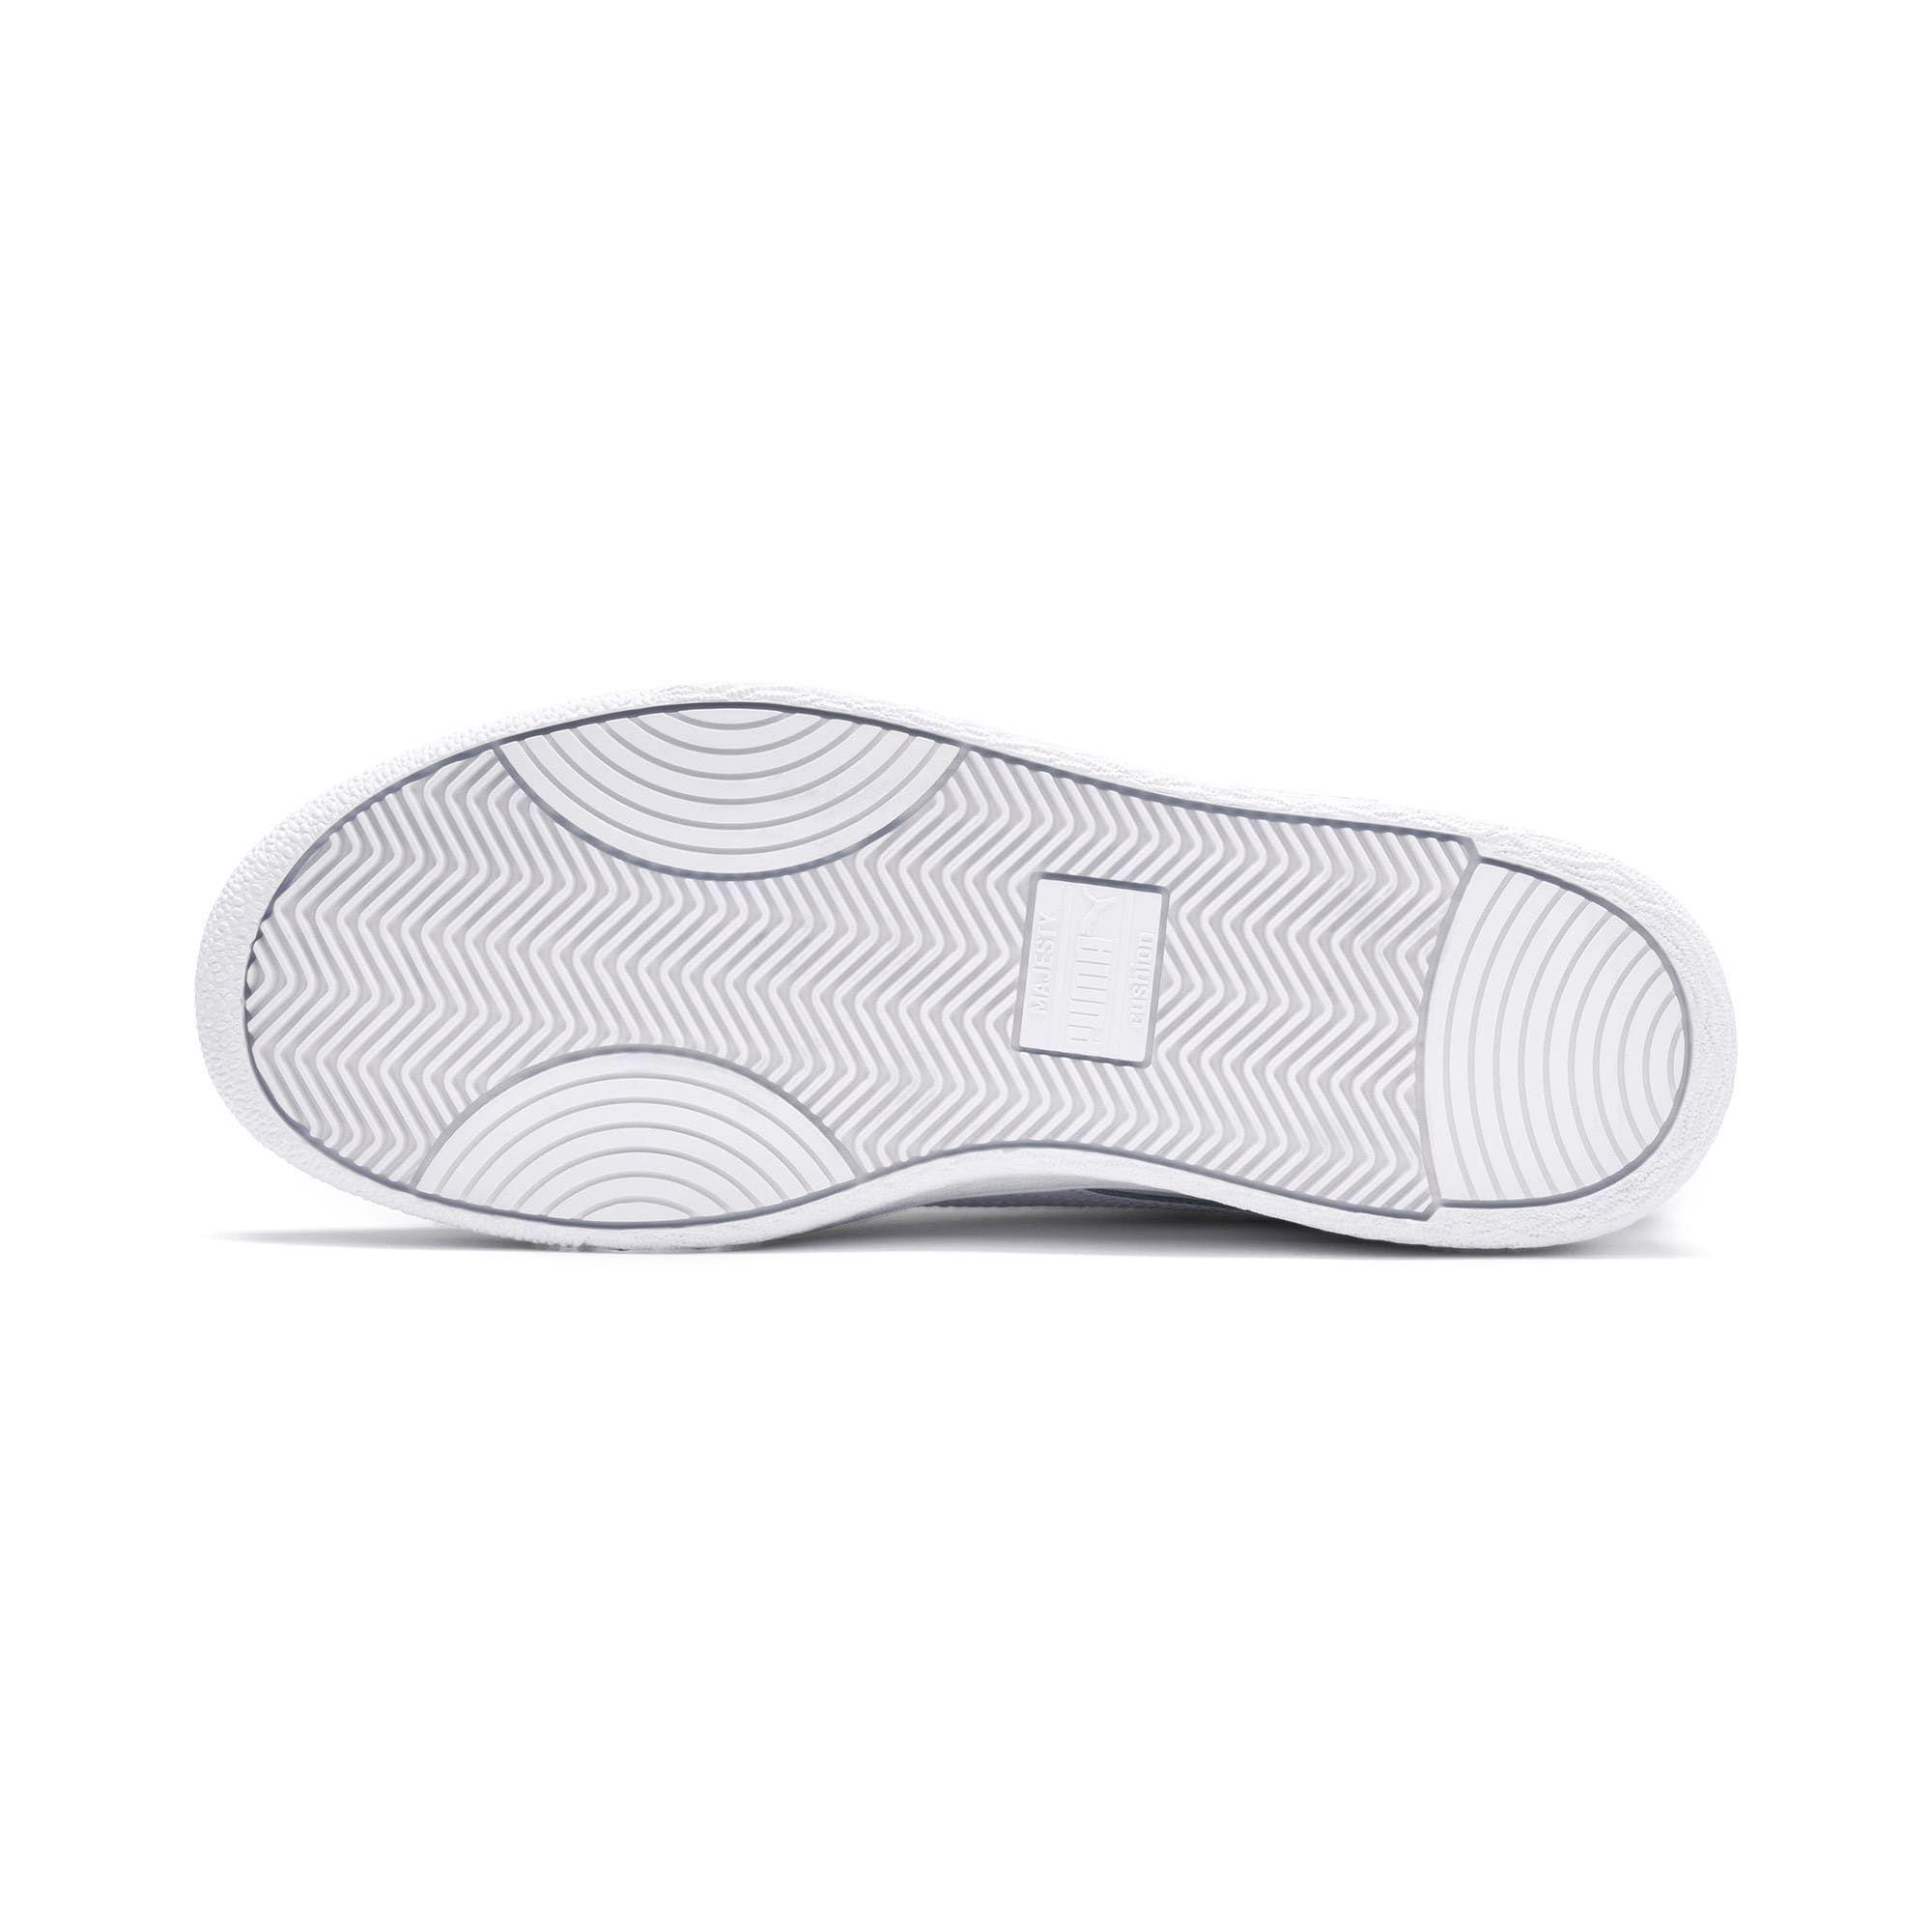 Men's PUMA Ralph Sampson Lo Trainers, White/White, size 5.5, Shoes